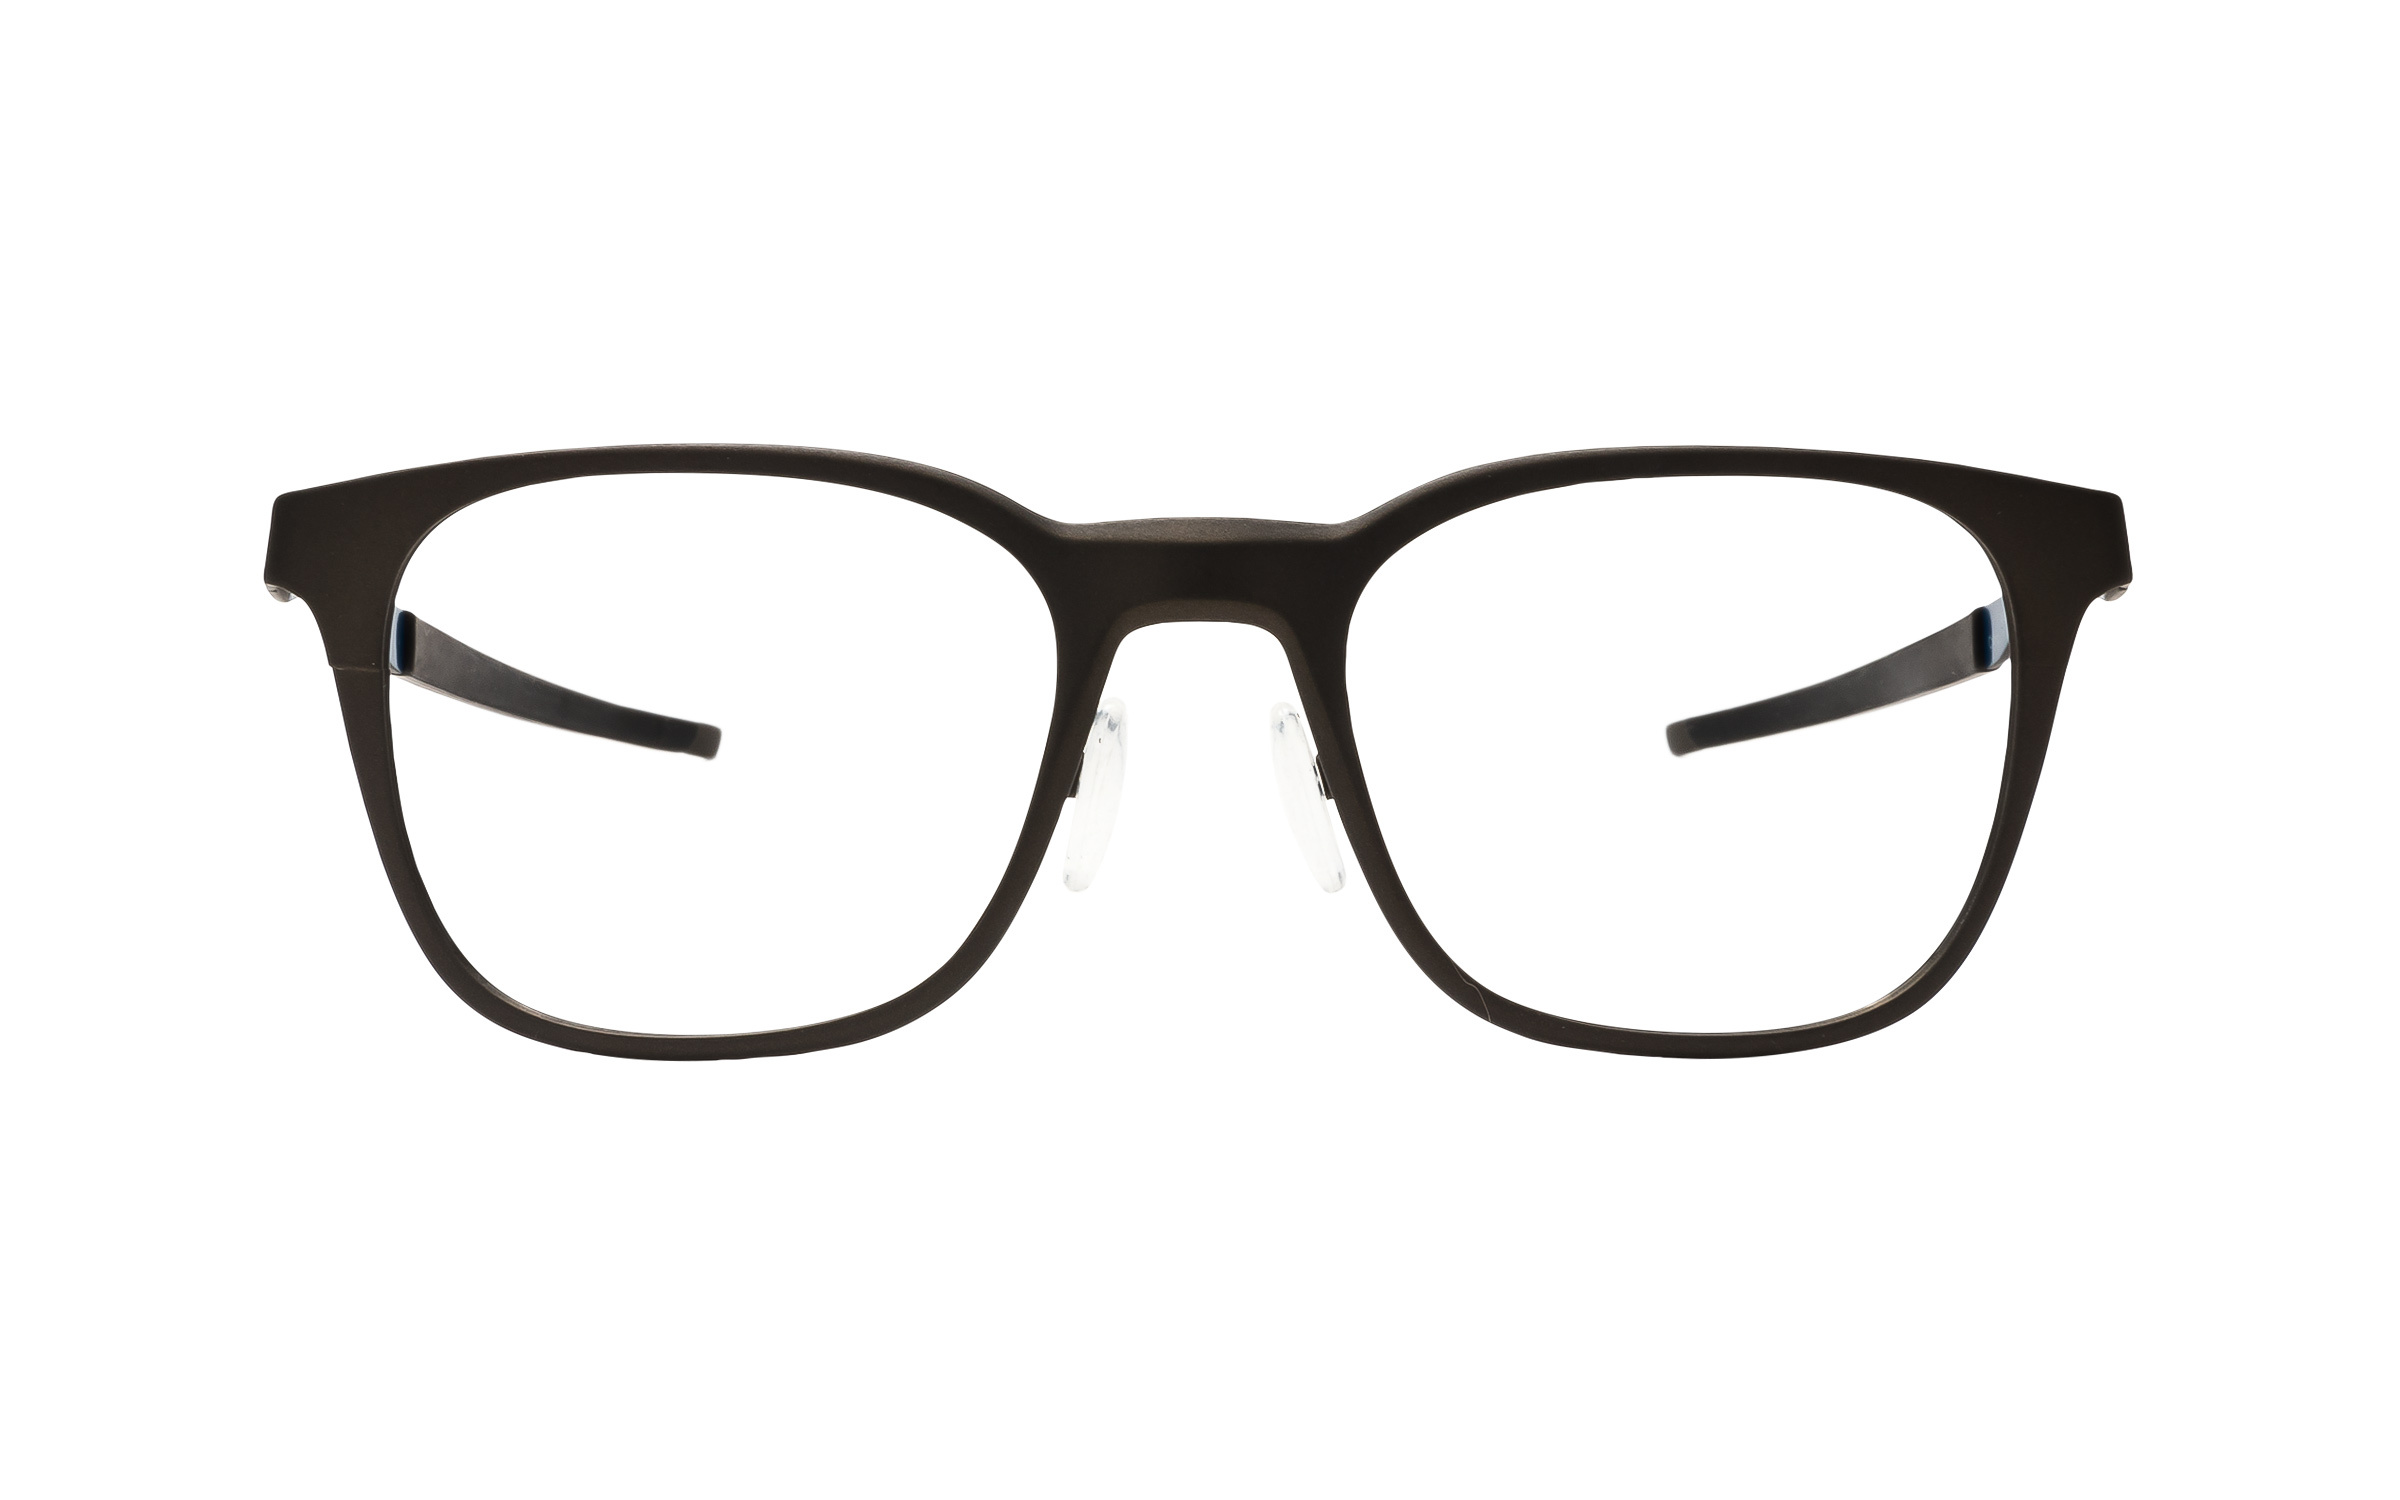 Luxottica Oakley Base Plane R OX3241 0349 (49) Eyeglasses and Frame in Satin Lead Grey | Plastic/Metal - Online Coastal